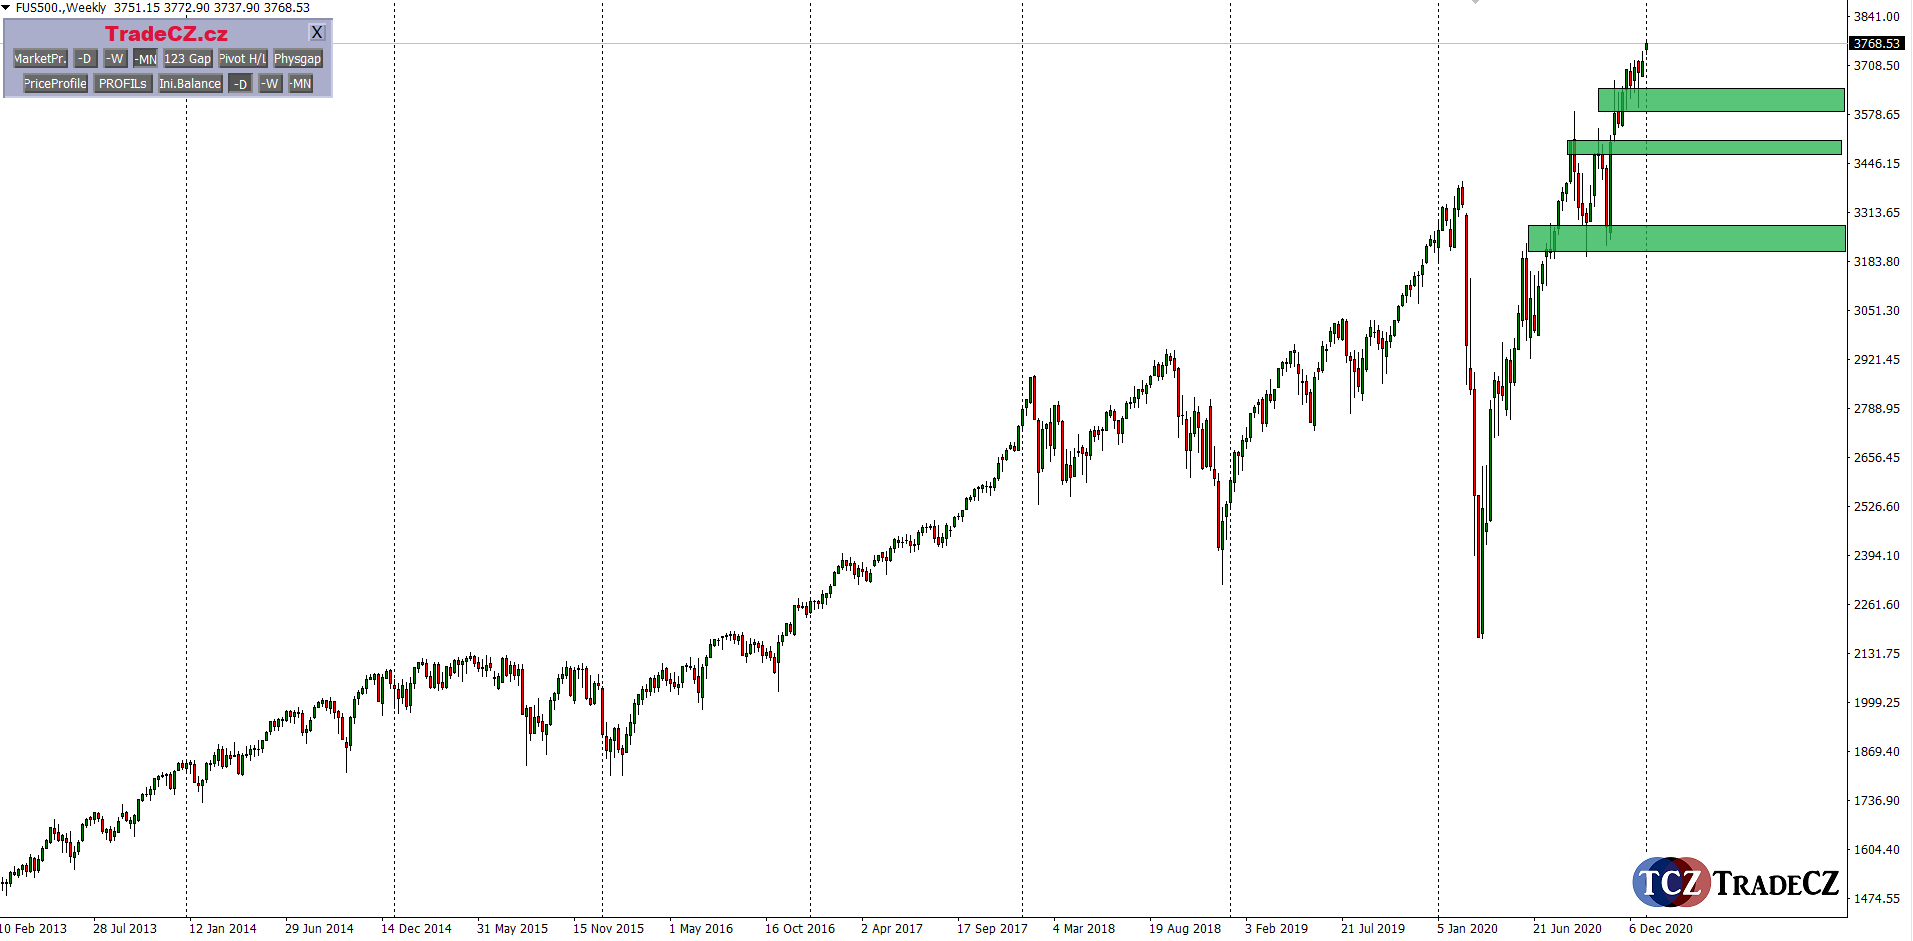 Analýza indexu SP500